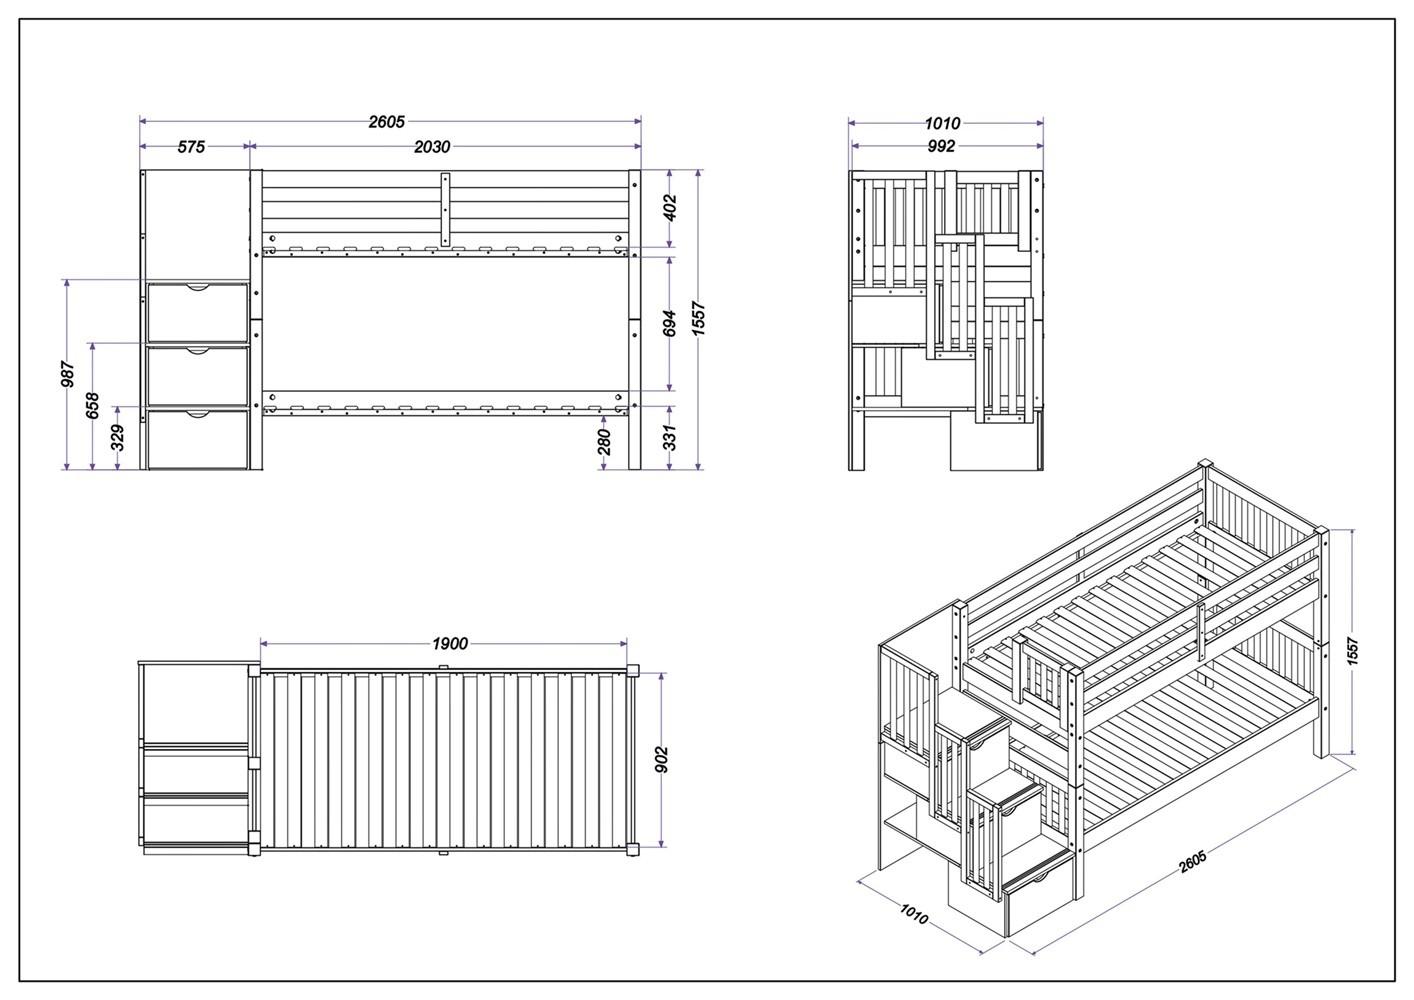 Beliche de Solteiro Victoria - Cama Auxiliar - Escada com 3 Gavetas - Capuccino